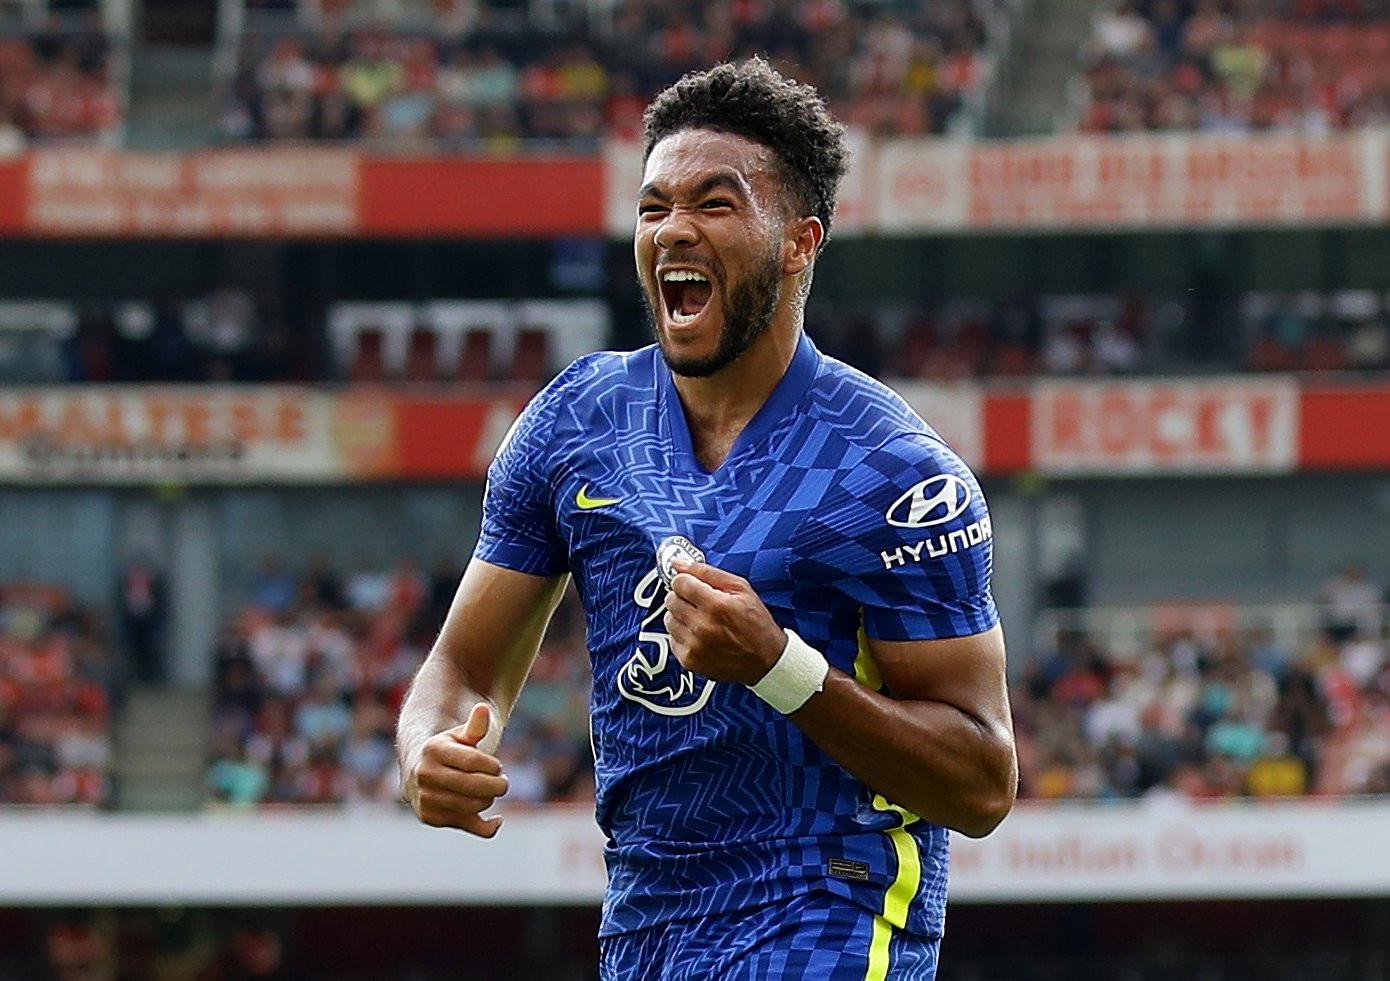 Reece James praises Romelu Lukaku for 'bullying' Arsenal players during Chelsea win